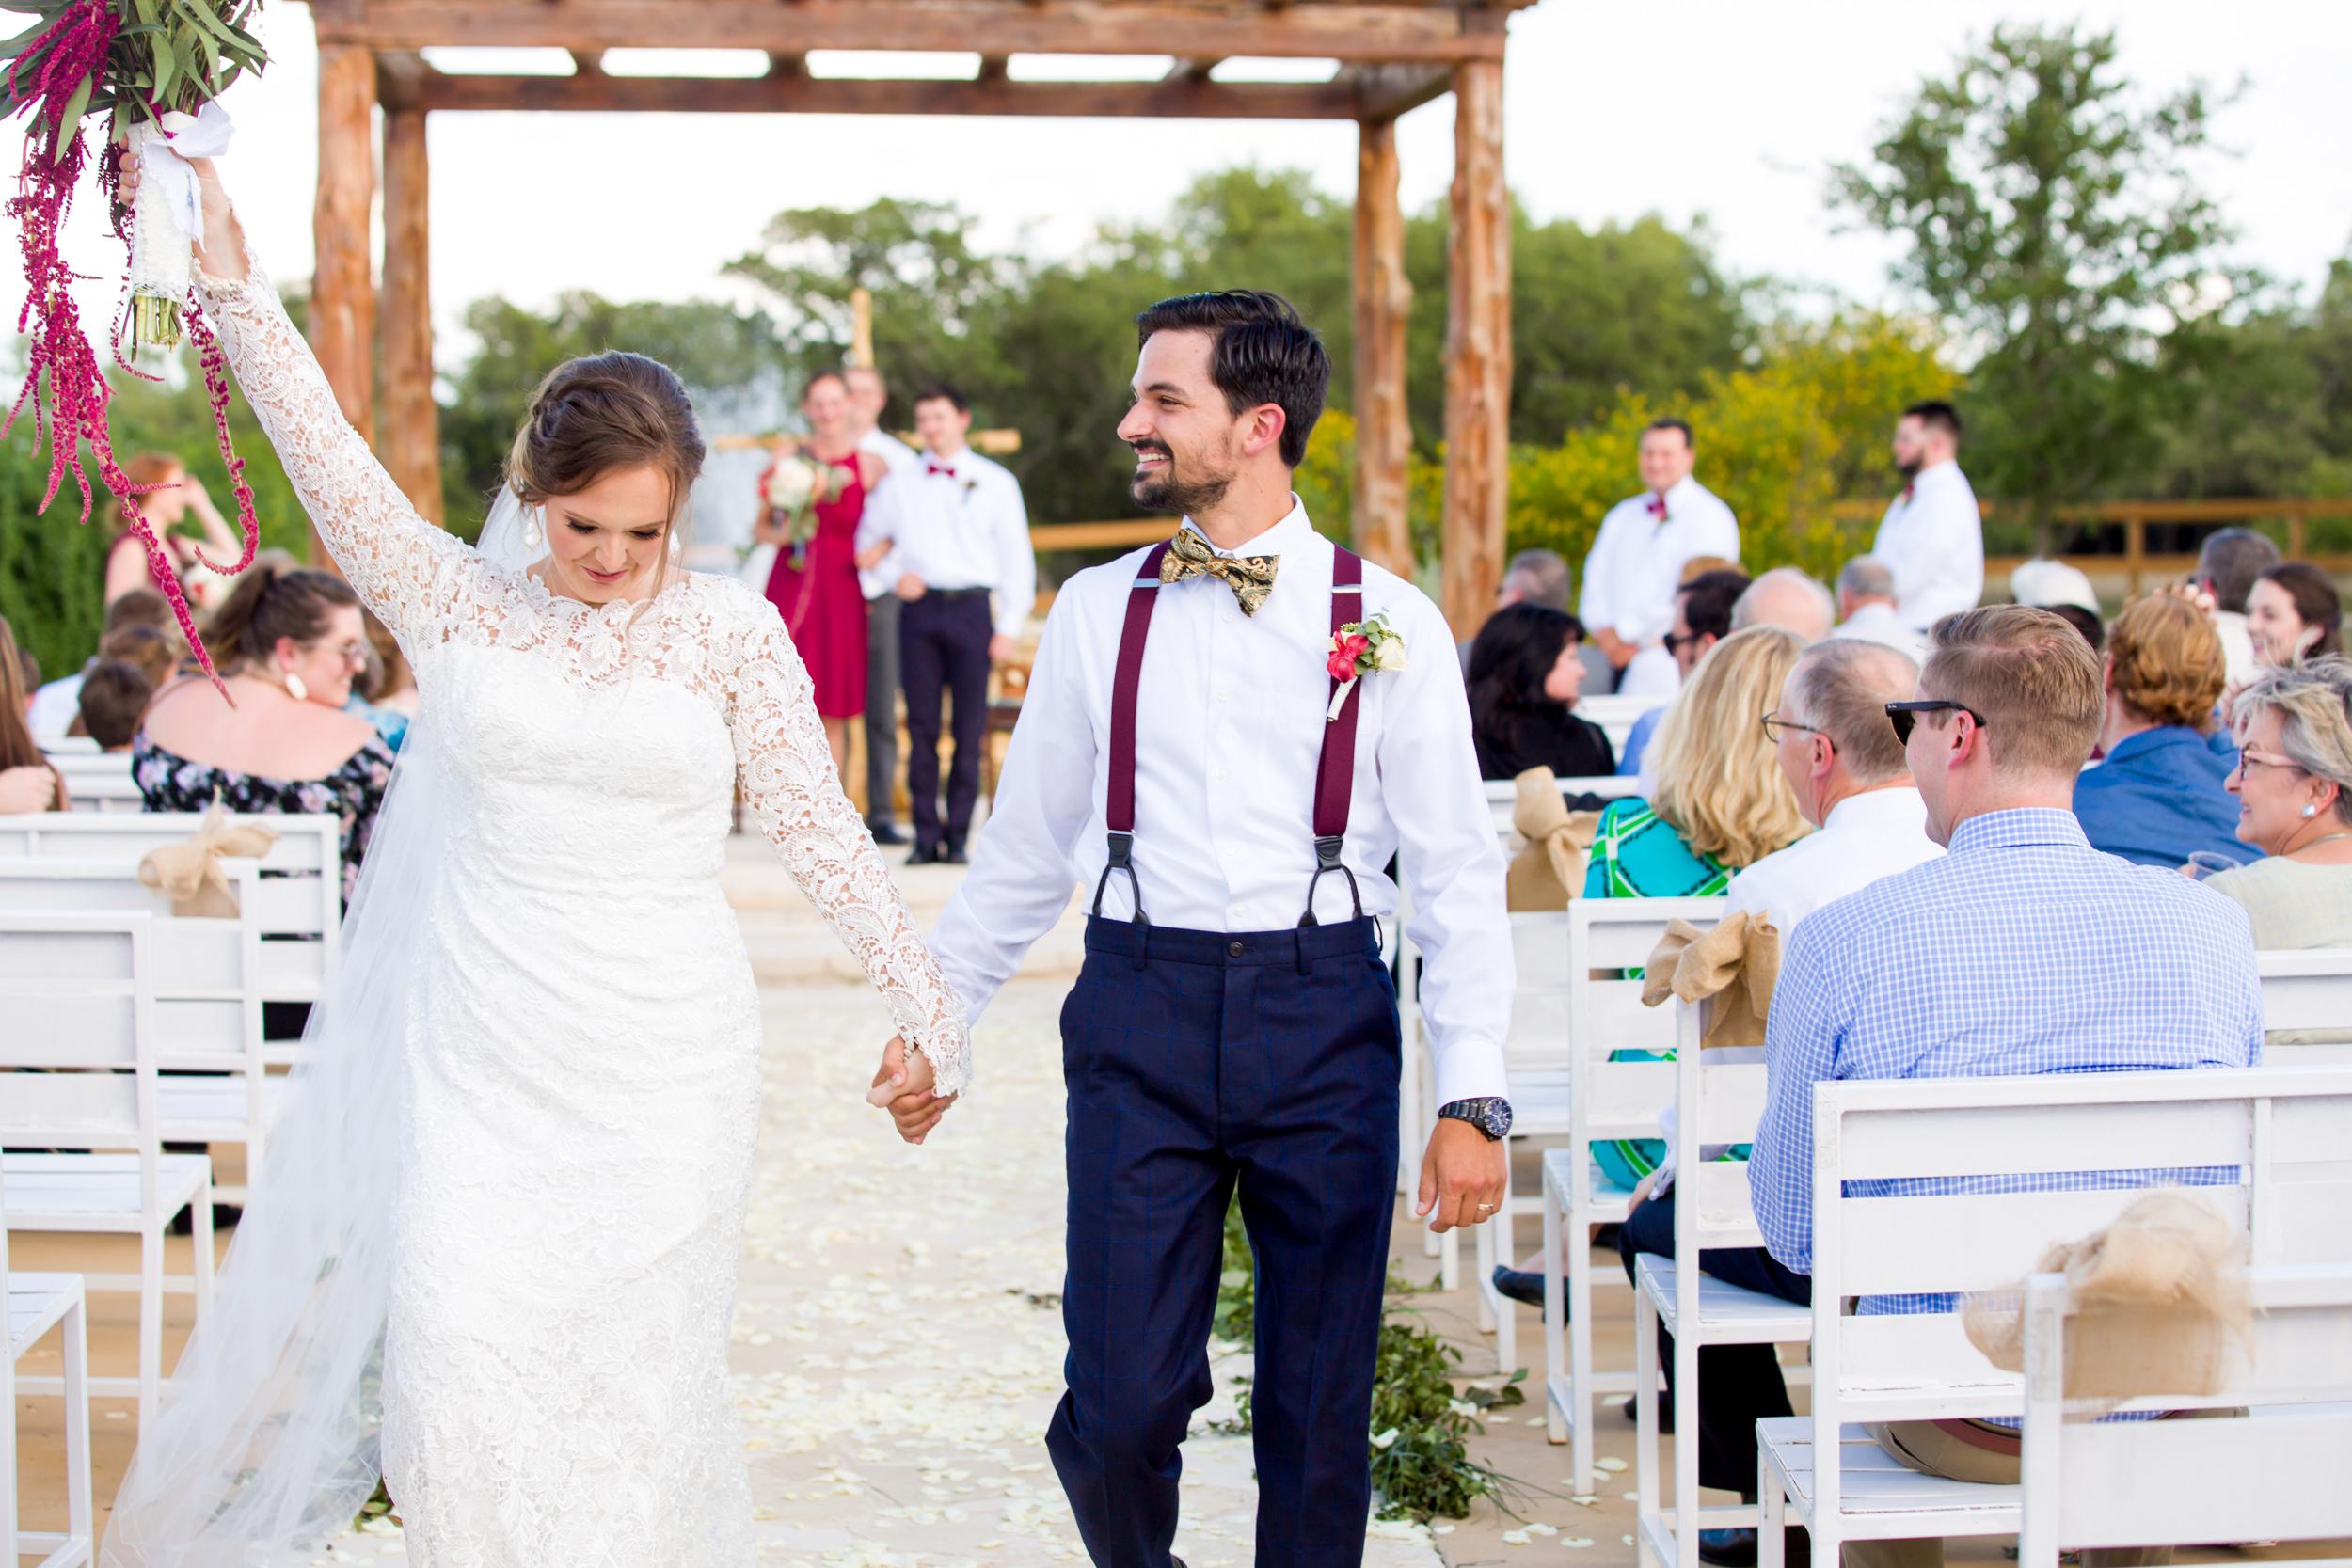 austin-wedding-colorful-34.jpg